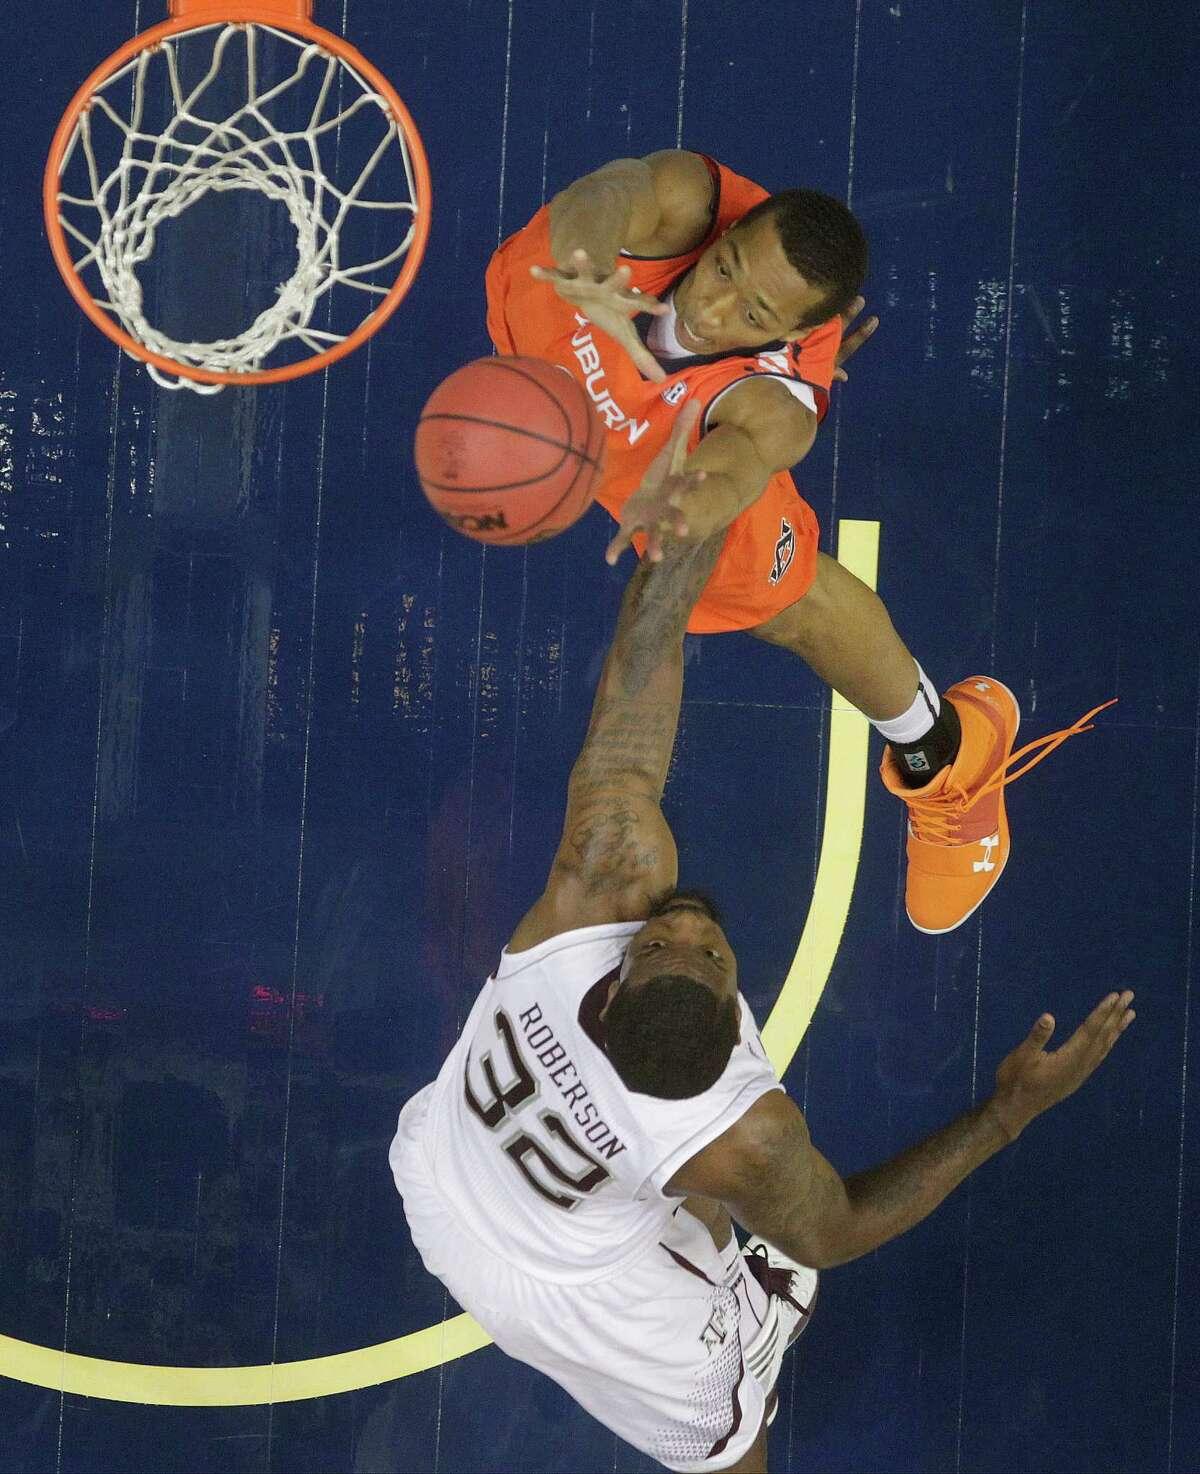 Auburn center Asauhn Dixon-Tatum (0) shoots as Texas A&M forward Kourtney Roberson (32) defends during the second half of an NCAA college basketball game at the Southeastern Conference tournament, Thursday, March 14, 2013, in Nashville, Tenn. Texas A&M won 71-62. (AP Photo/Dave Martin)